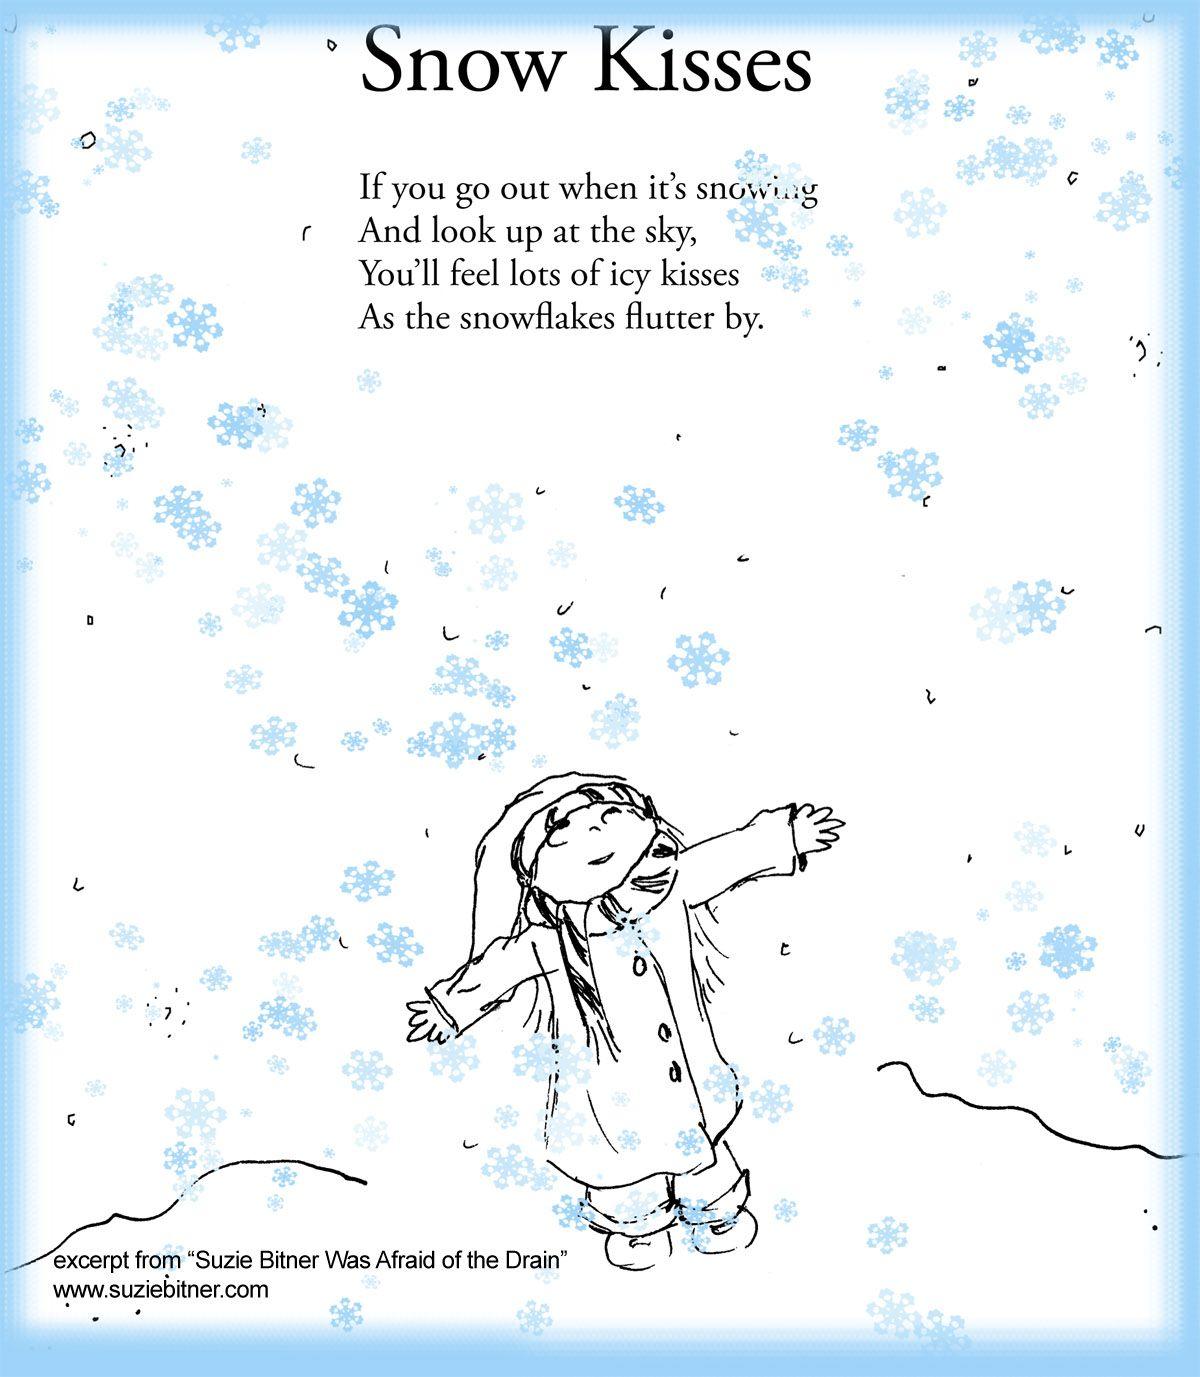 snow kisses poem children u0027s poem for winter great for